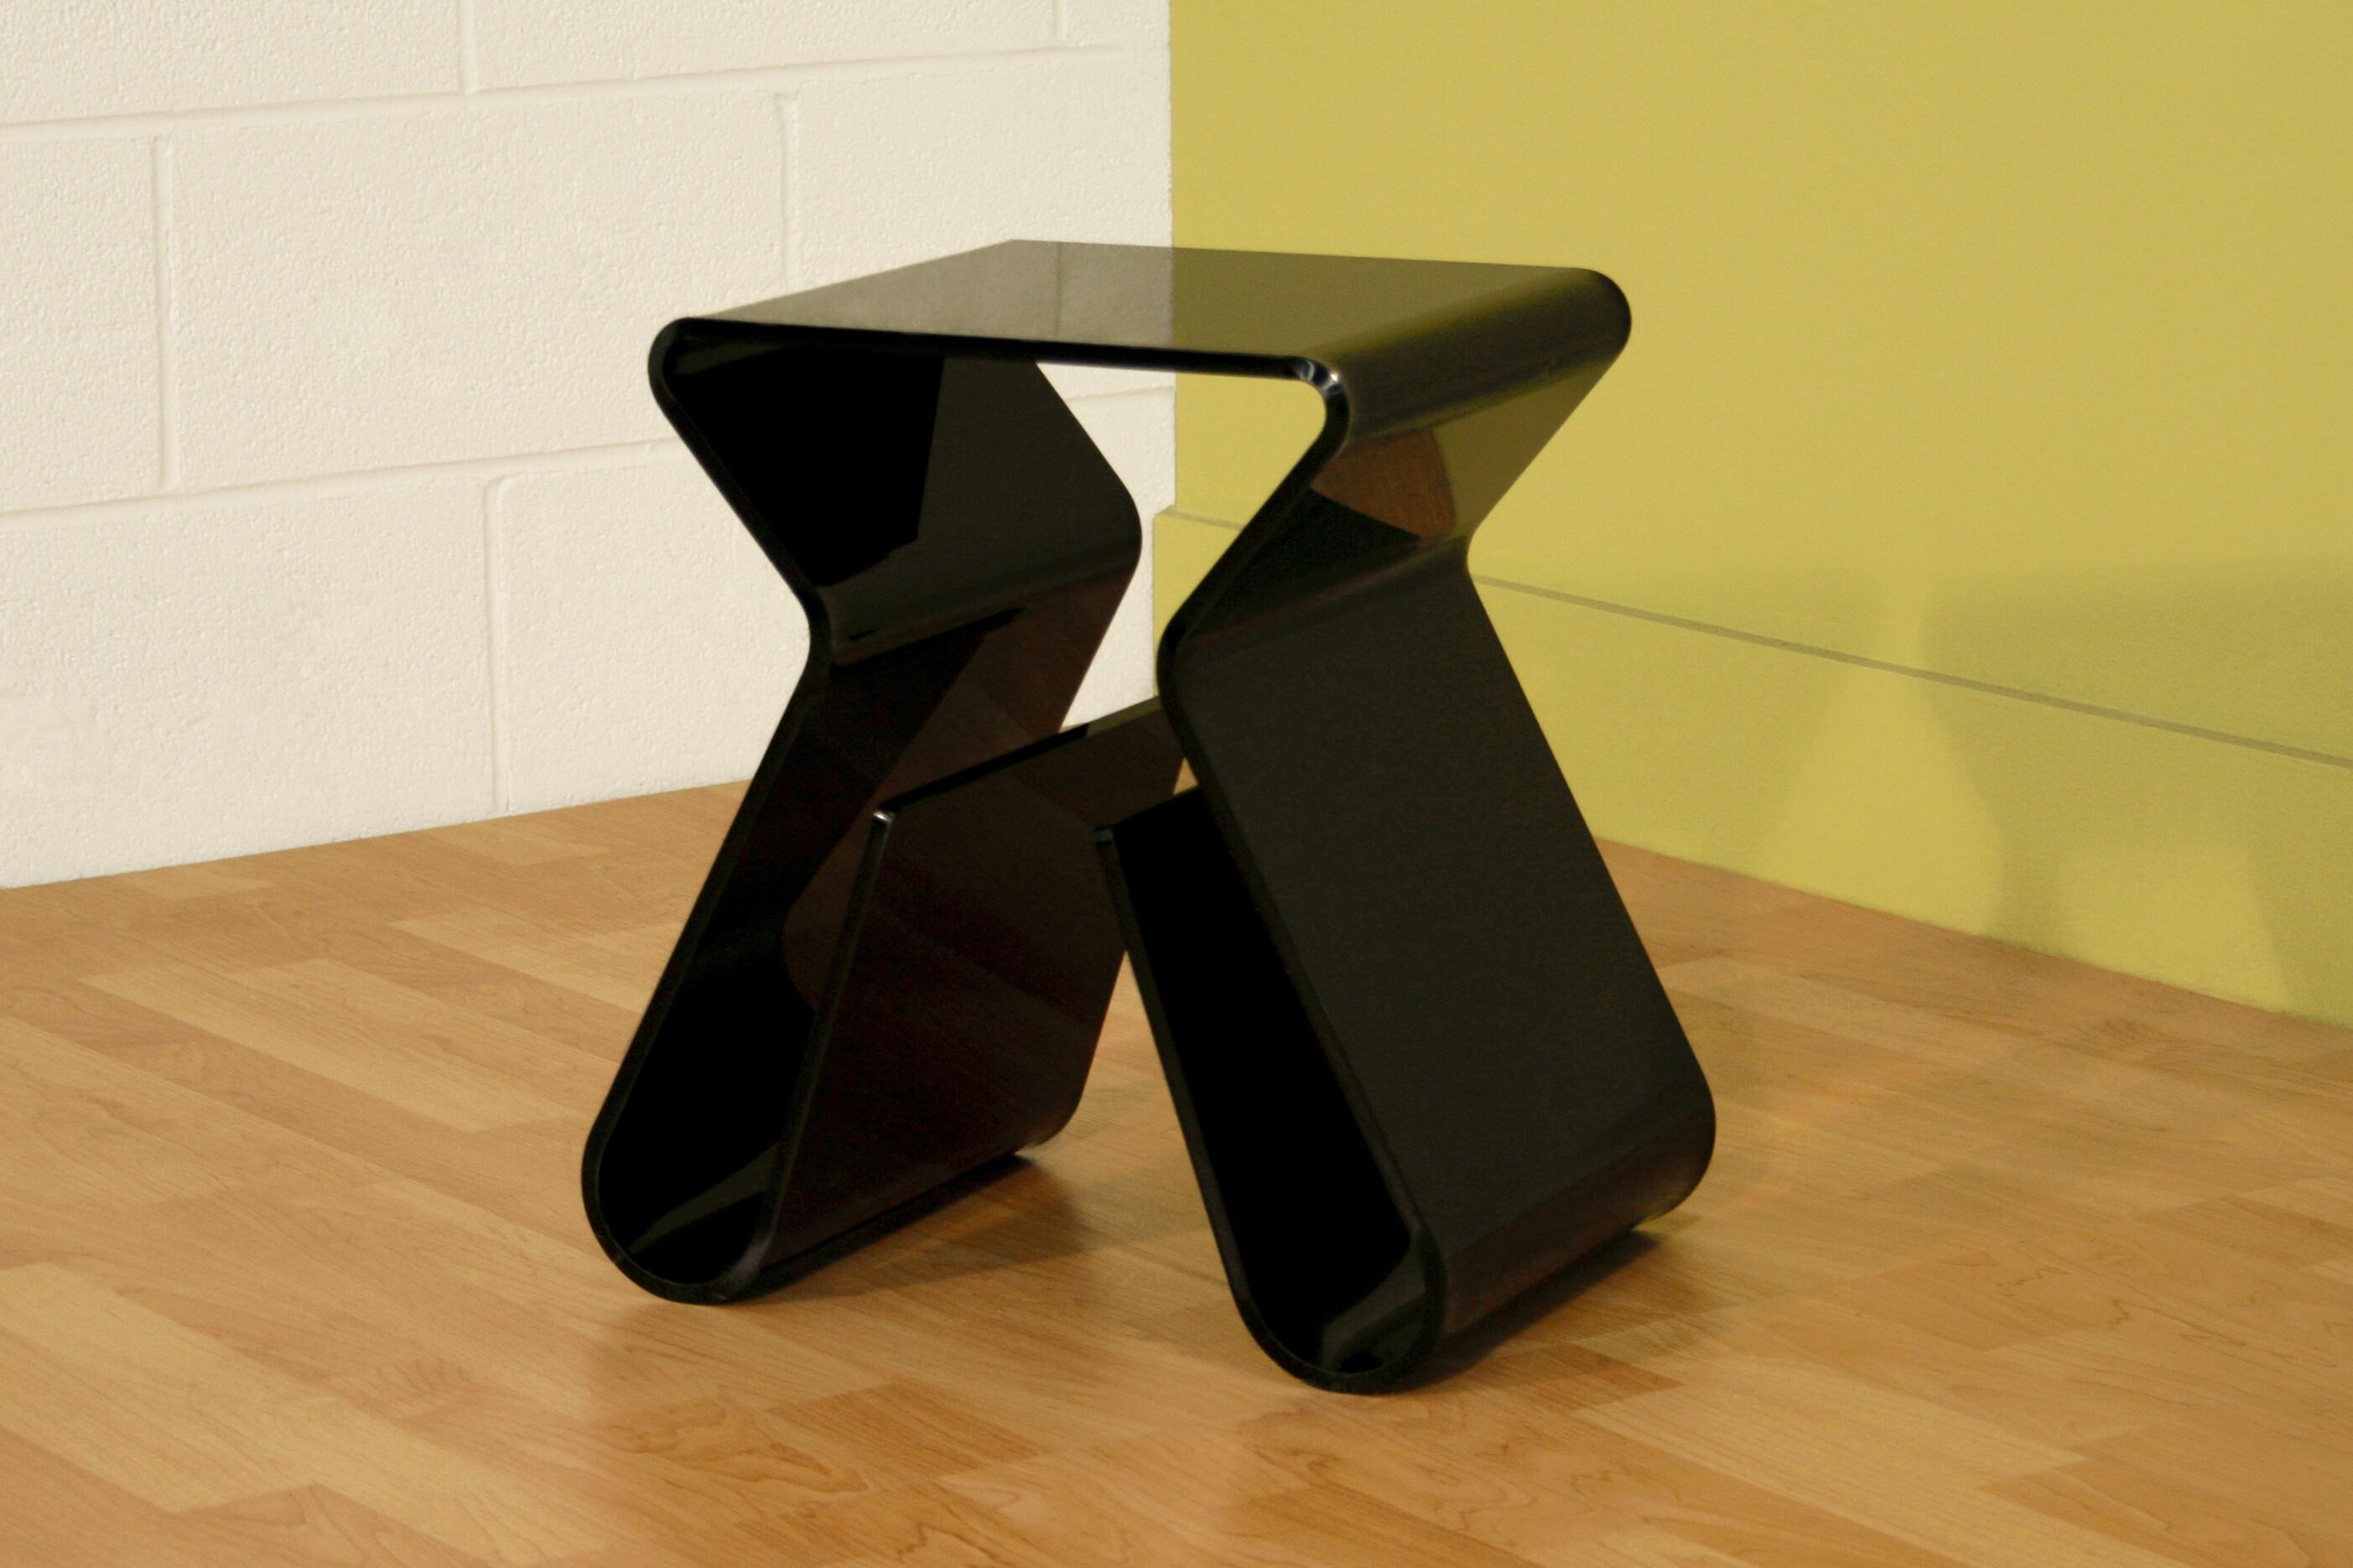 Baxton Studio Alec Black Acrylic Stool/ End Table